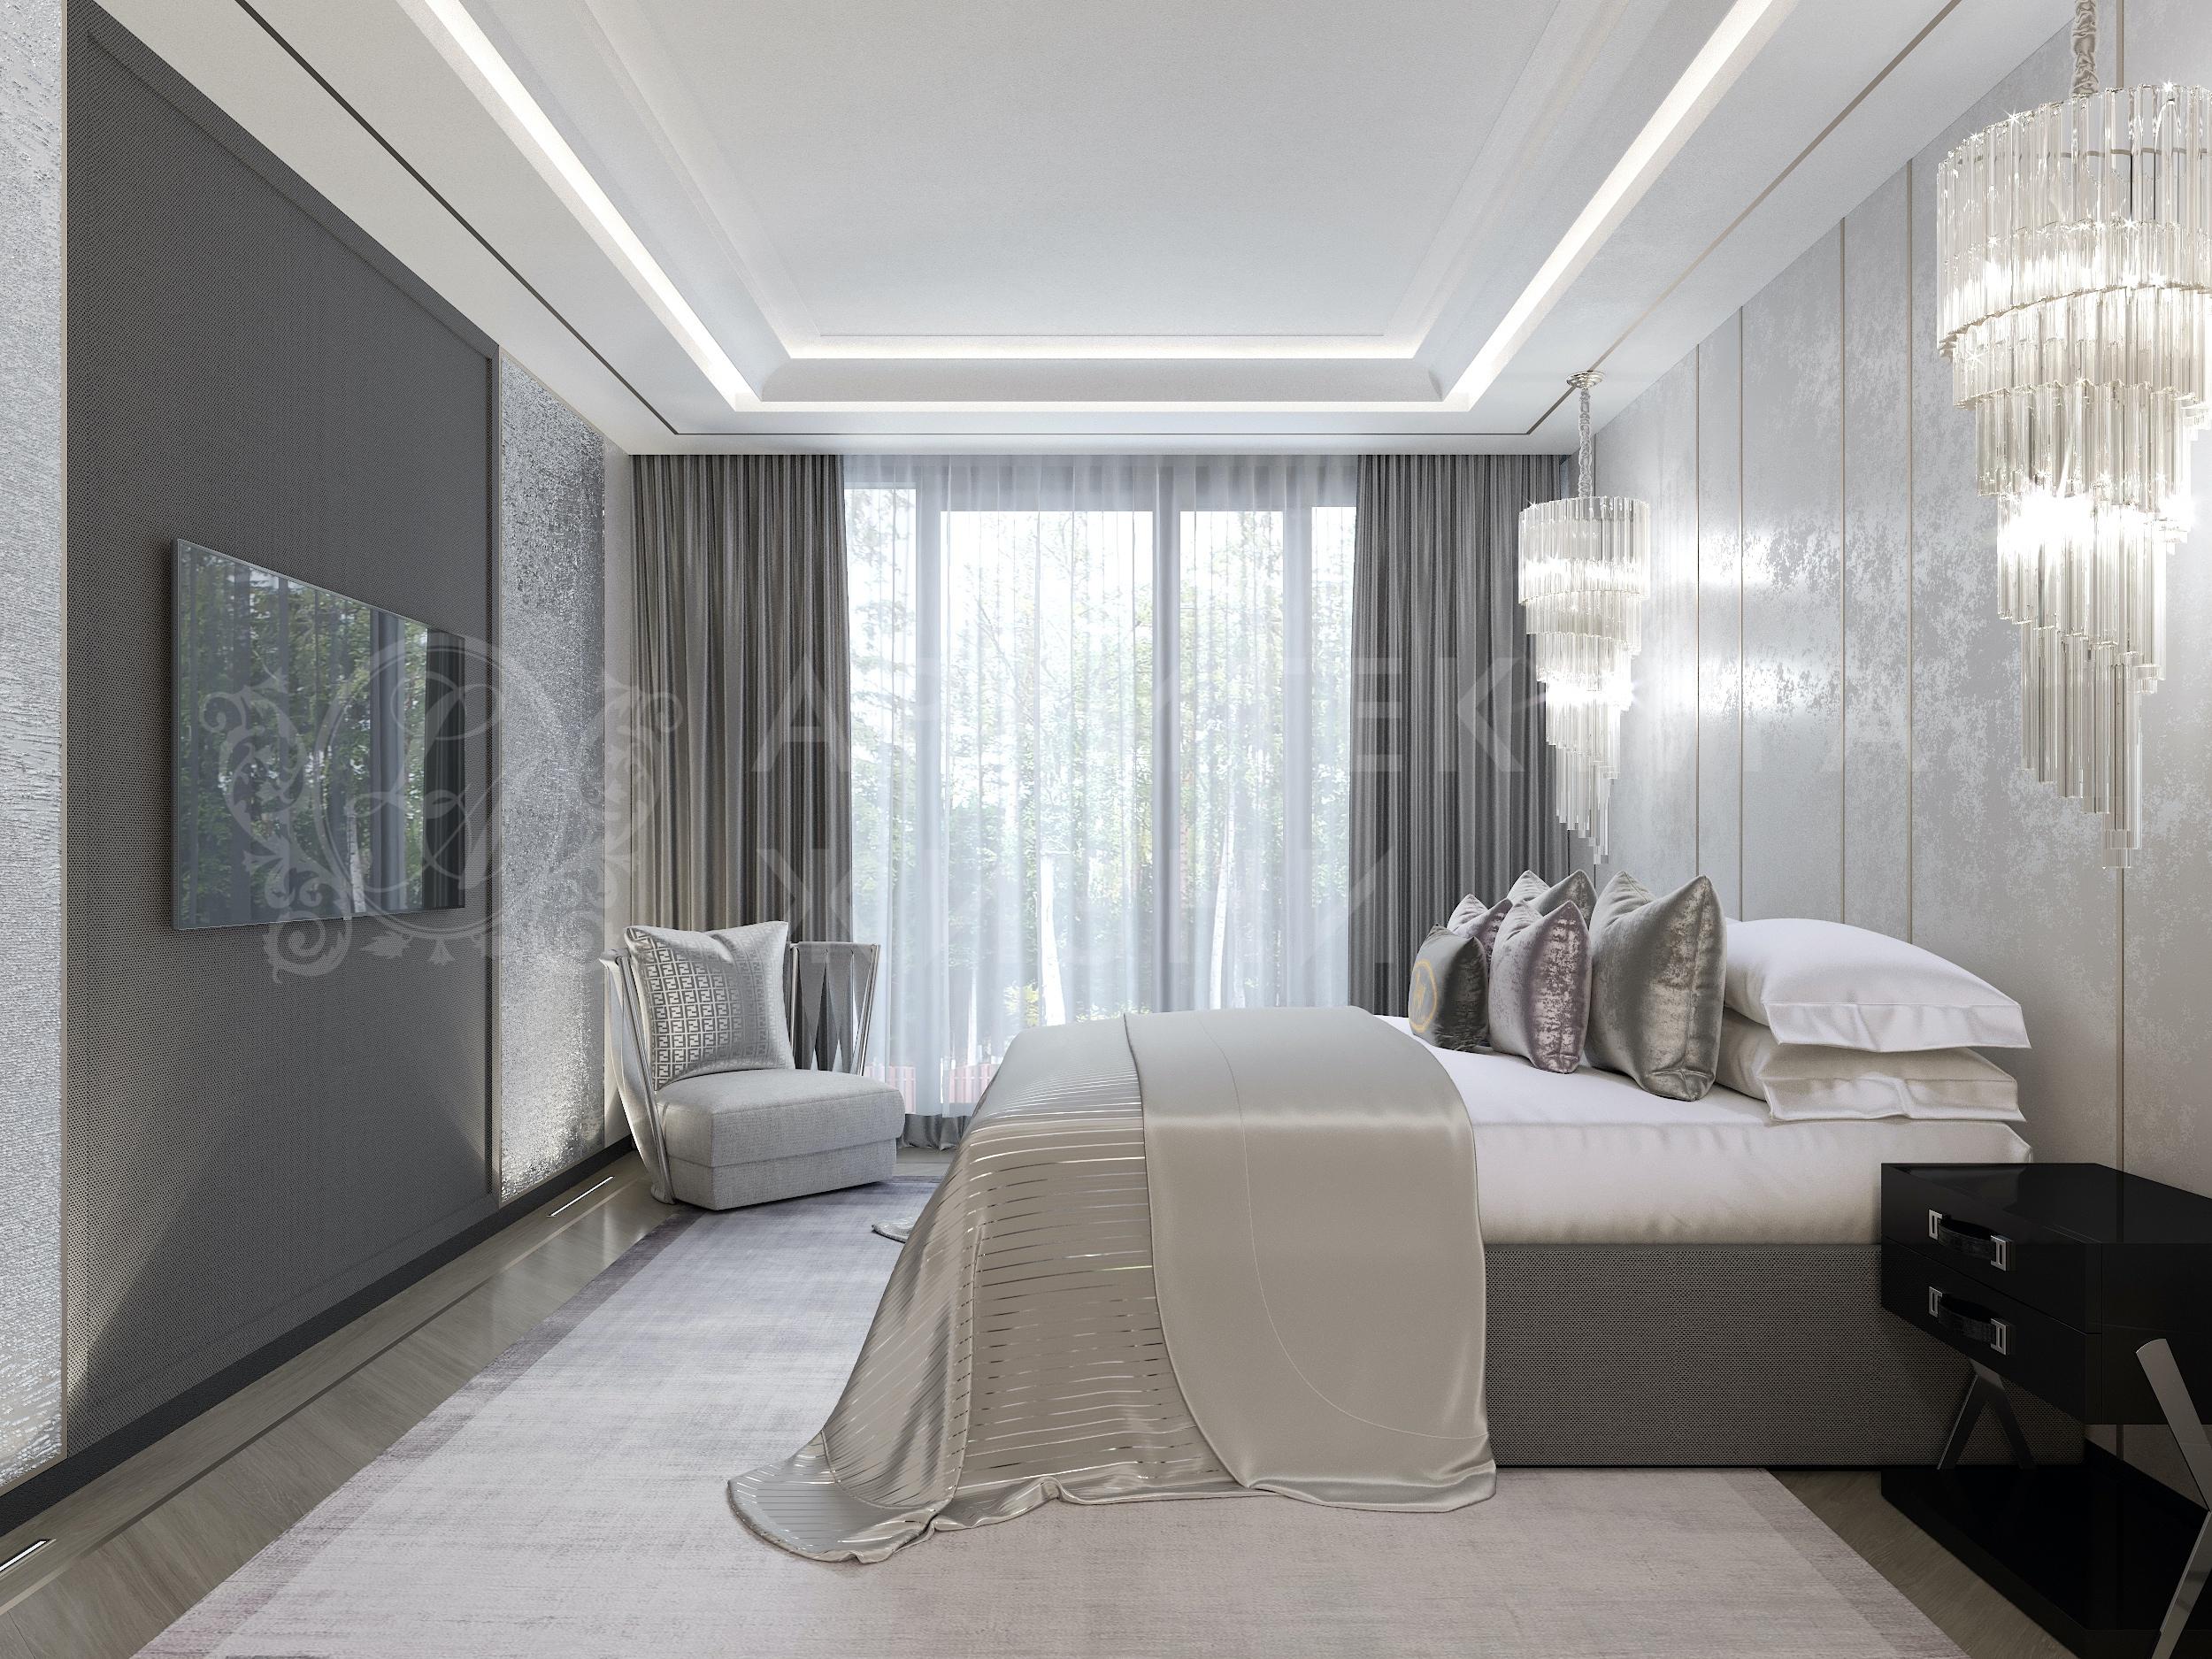 BedroomVid1.jpg